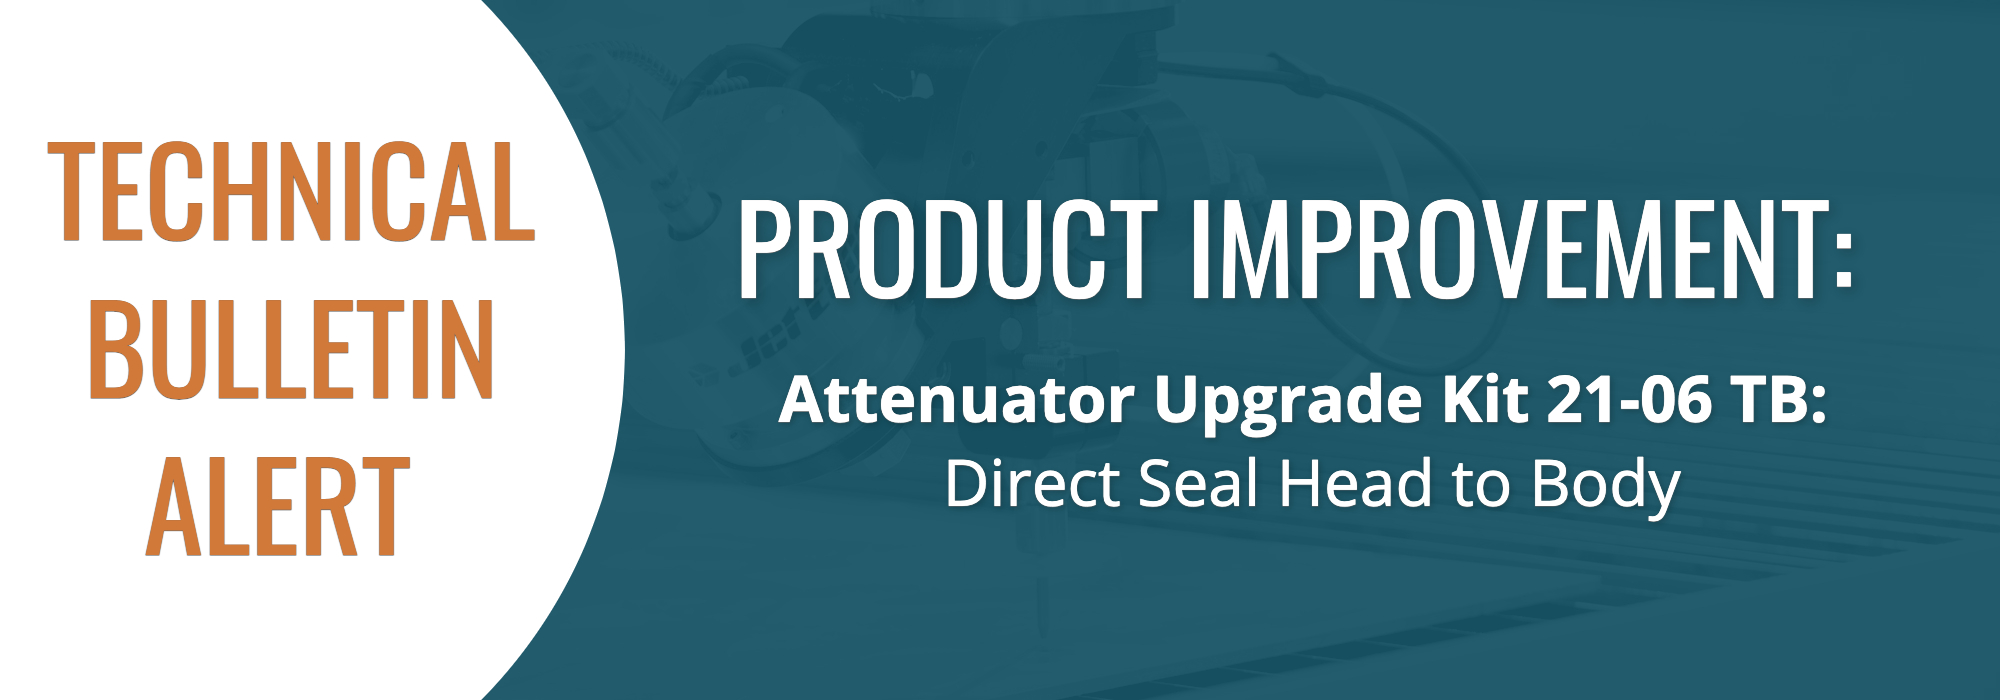 Technical Bulletin - Attenuator Upgrade Kits (1)